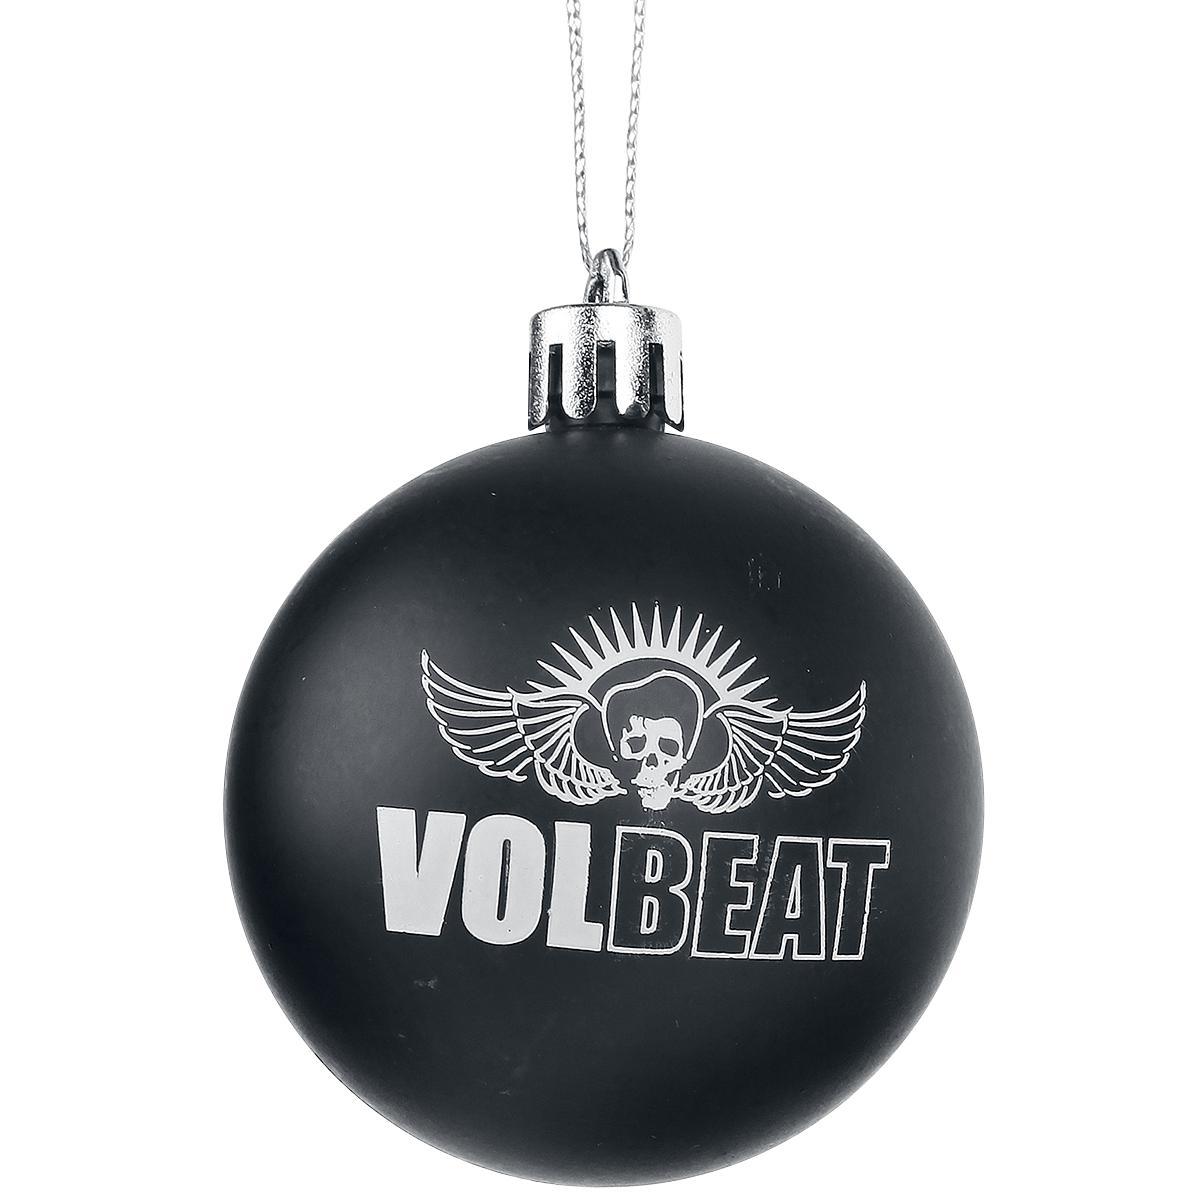 volbeat-baum-kugel-emp